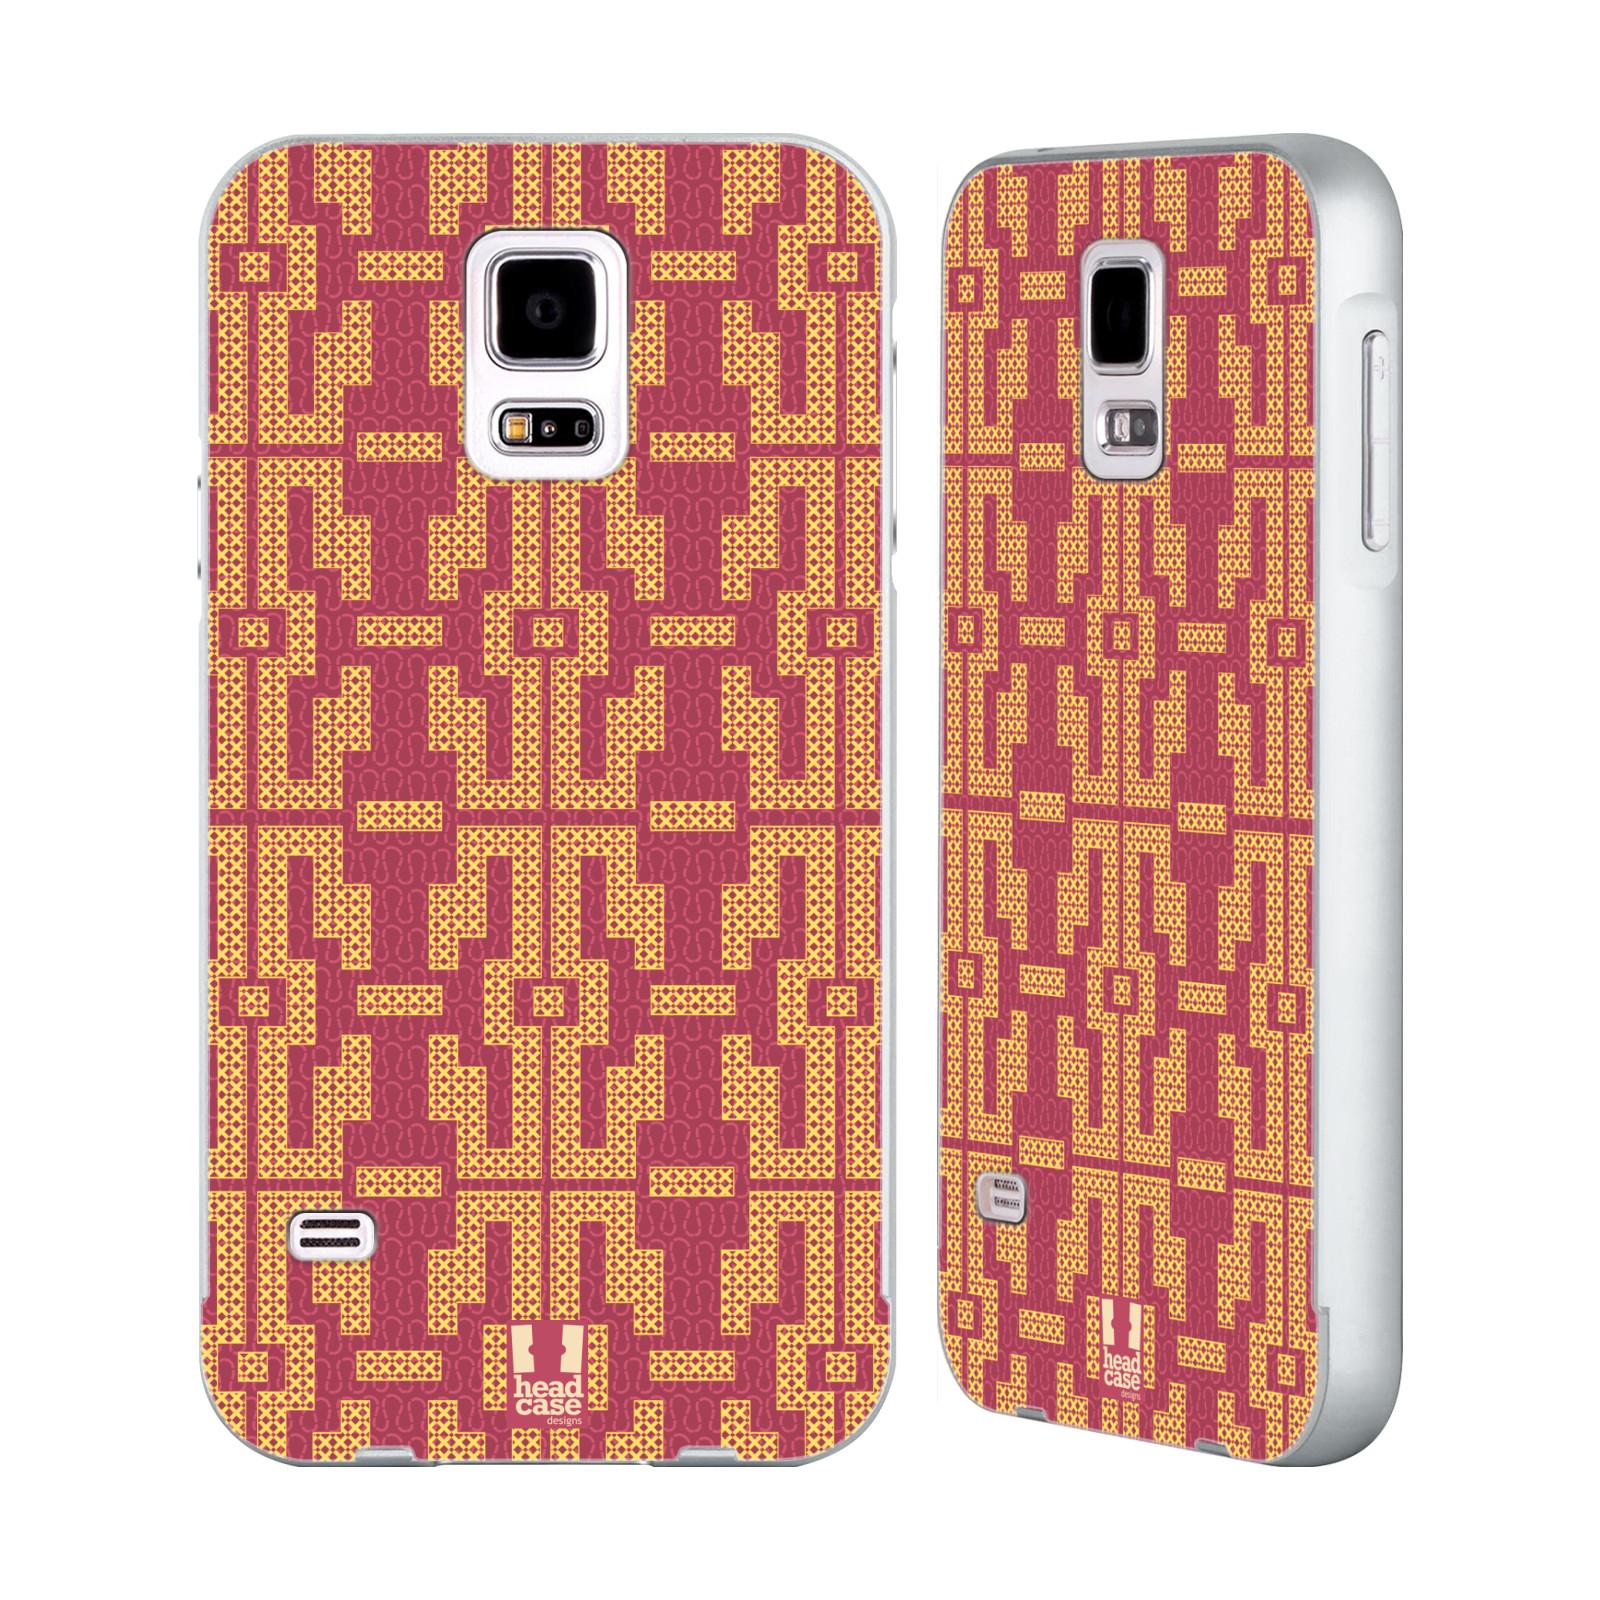 HEAD-CASE-DESIGNS-GLAM-AMAZON-SILVER-BUMPER-SLIDER-CASE-FOR-SAMSUNG-PHONES